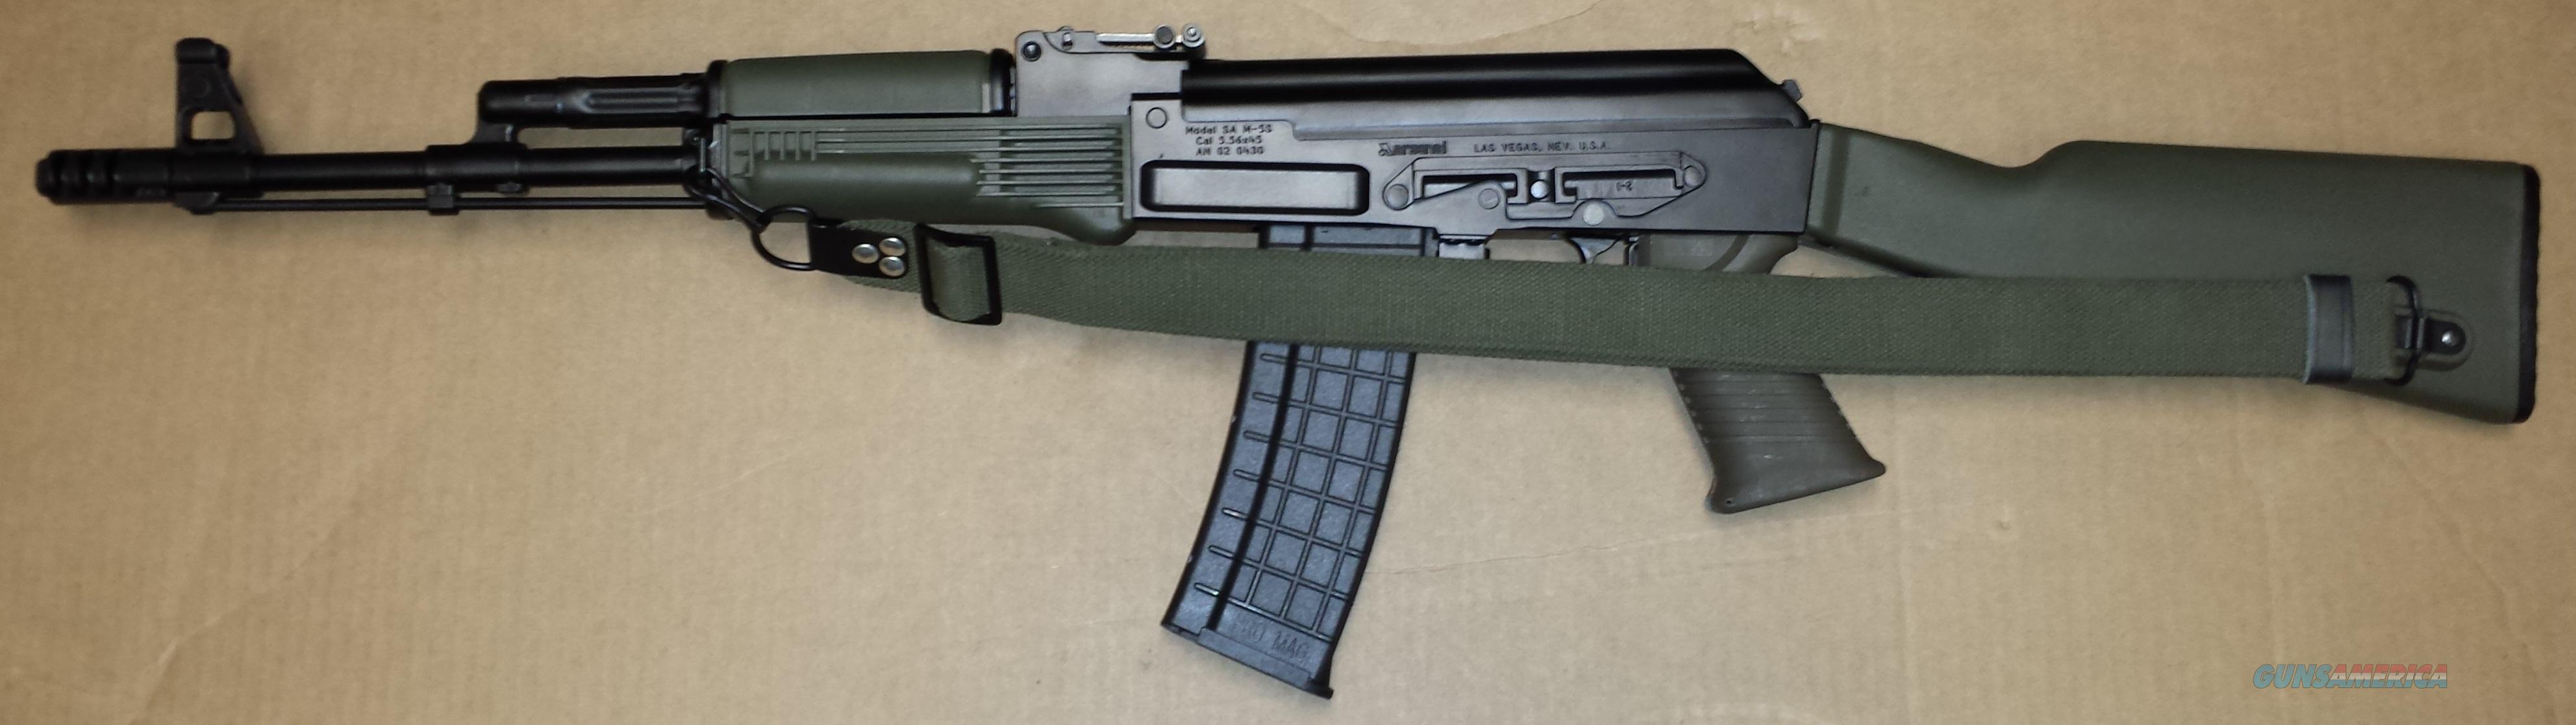 Arsenal Usa Sa M5s Milled Receiver 5 56 223 Ak4 For Sale